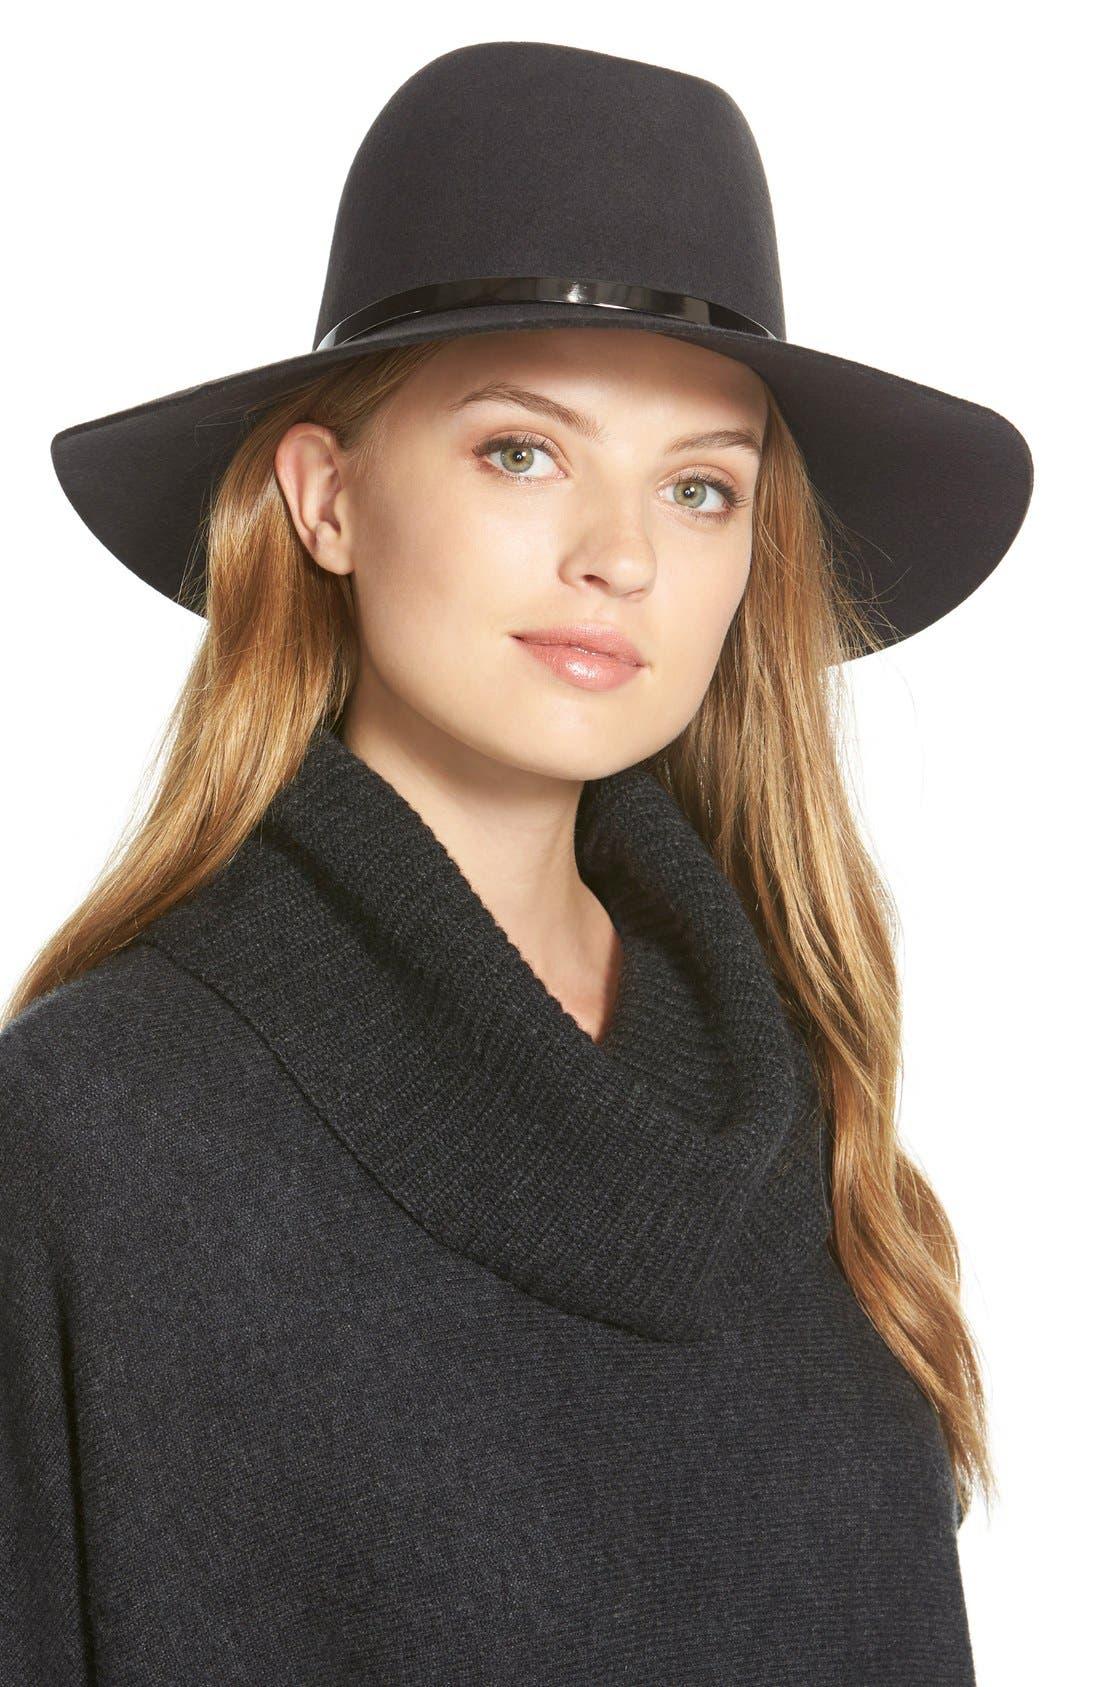 Main Image - Janessa Leone 'Slate' Floppy Wool Felt Hat